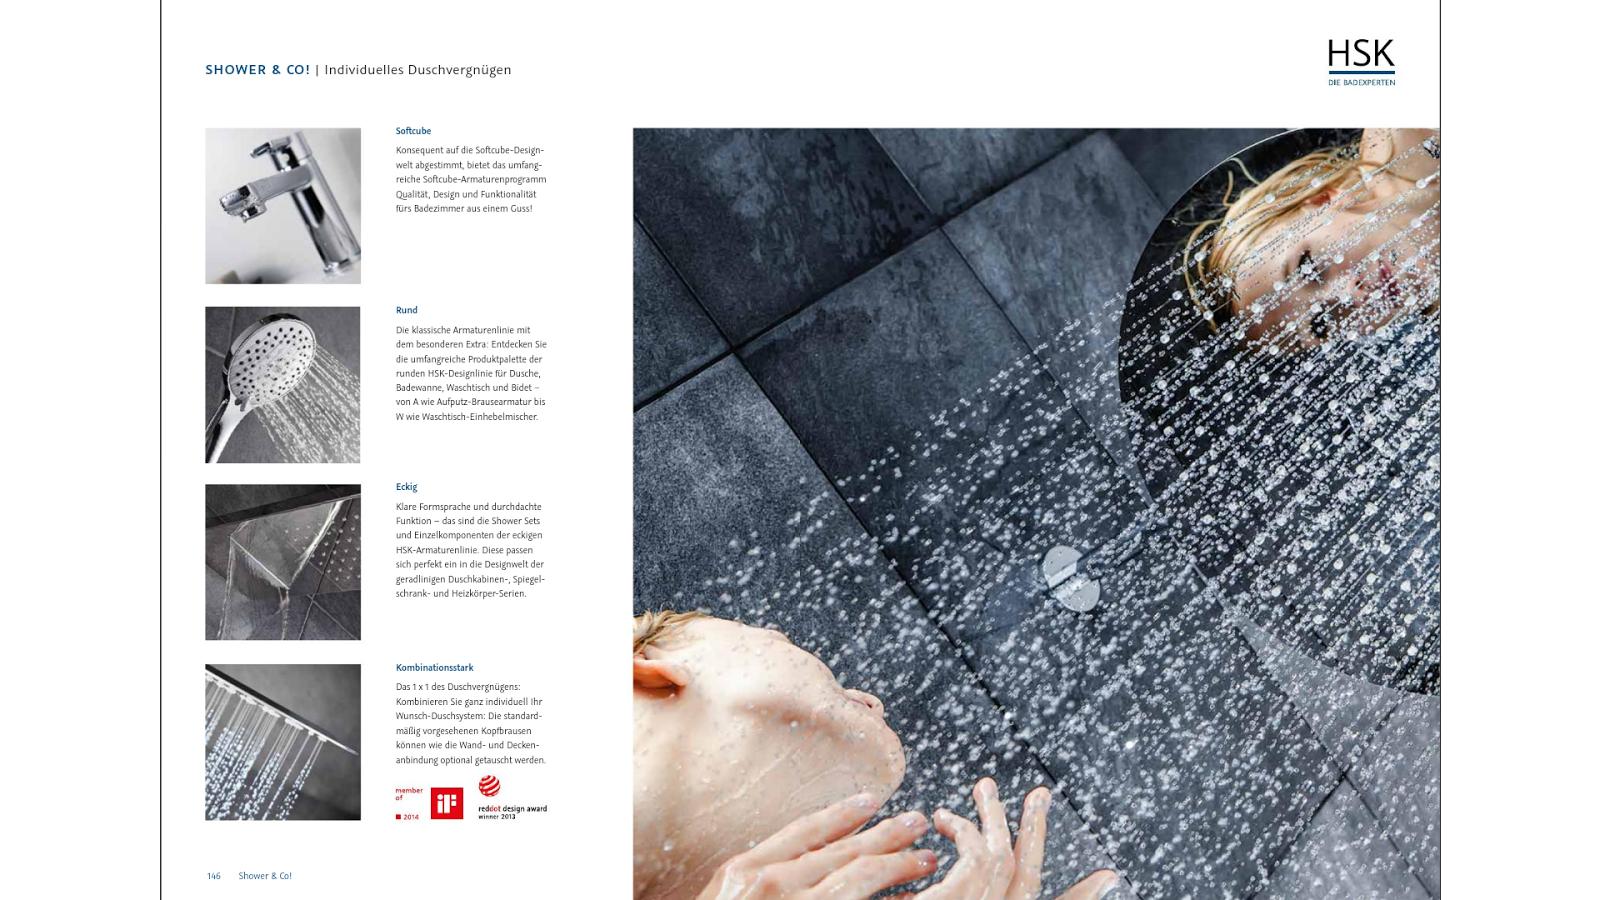 Hsk Duschkabine Katalog | smartpersoneelsdossier